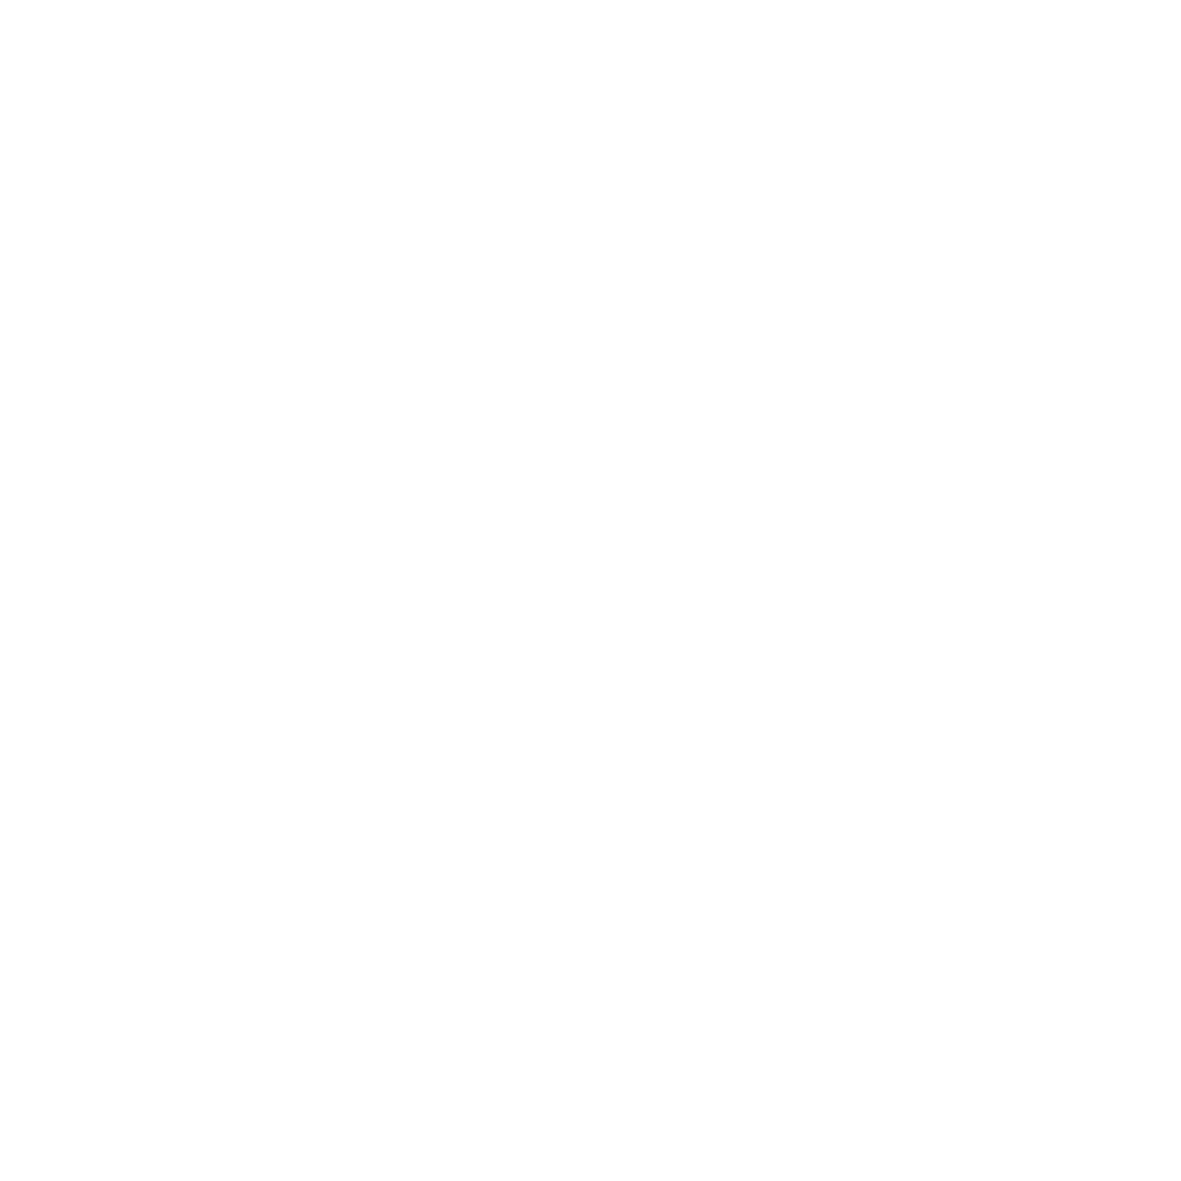 Icon op avontuur